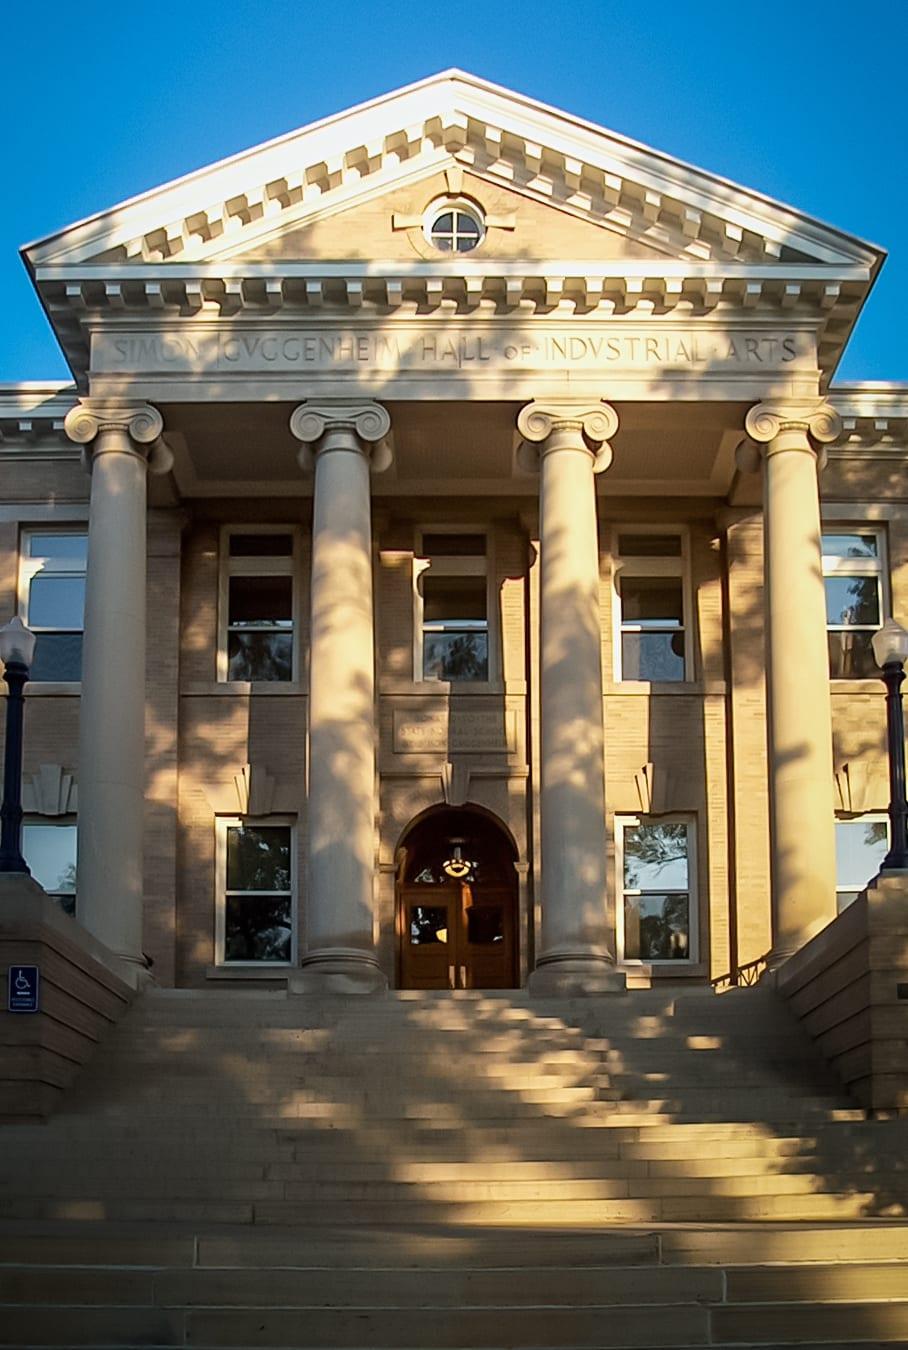 Guggenheim Hall University of Northern Colorado Greeley